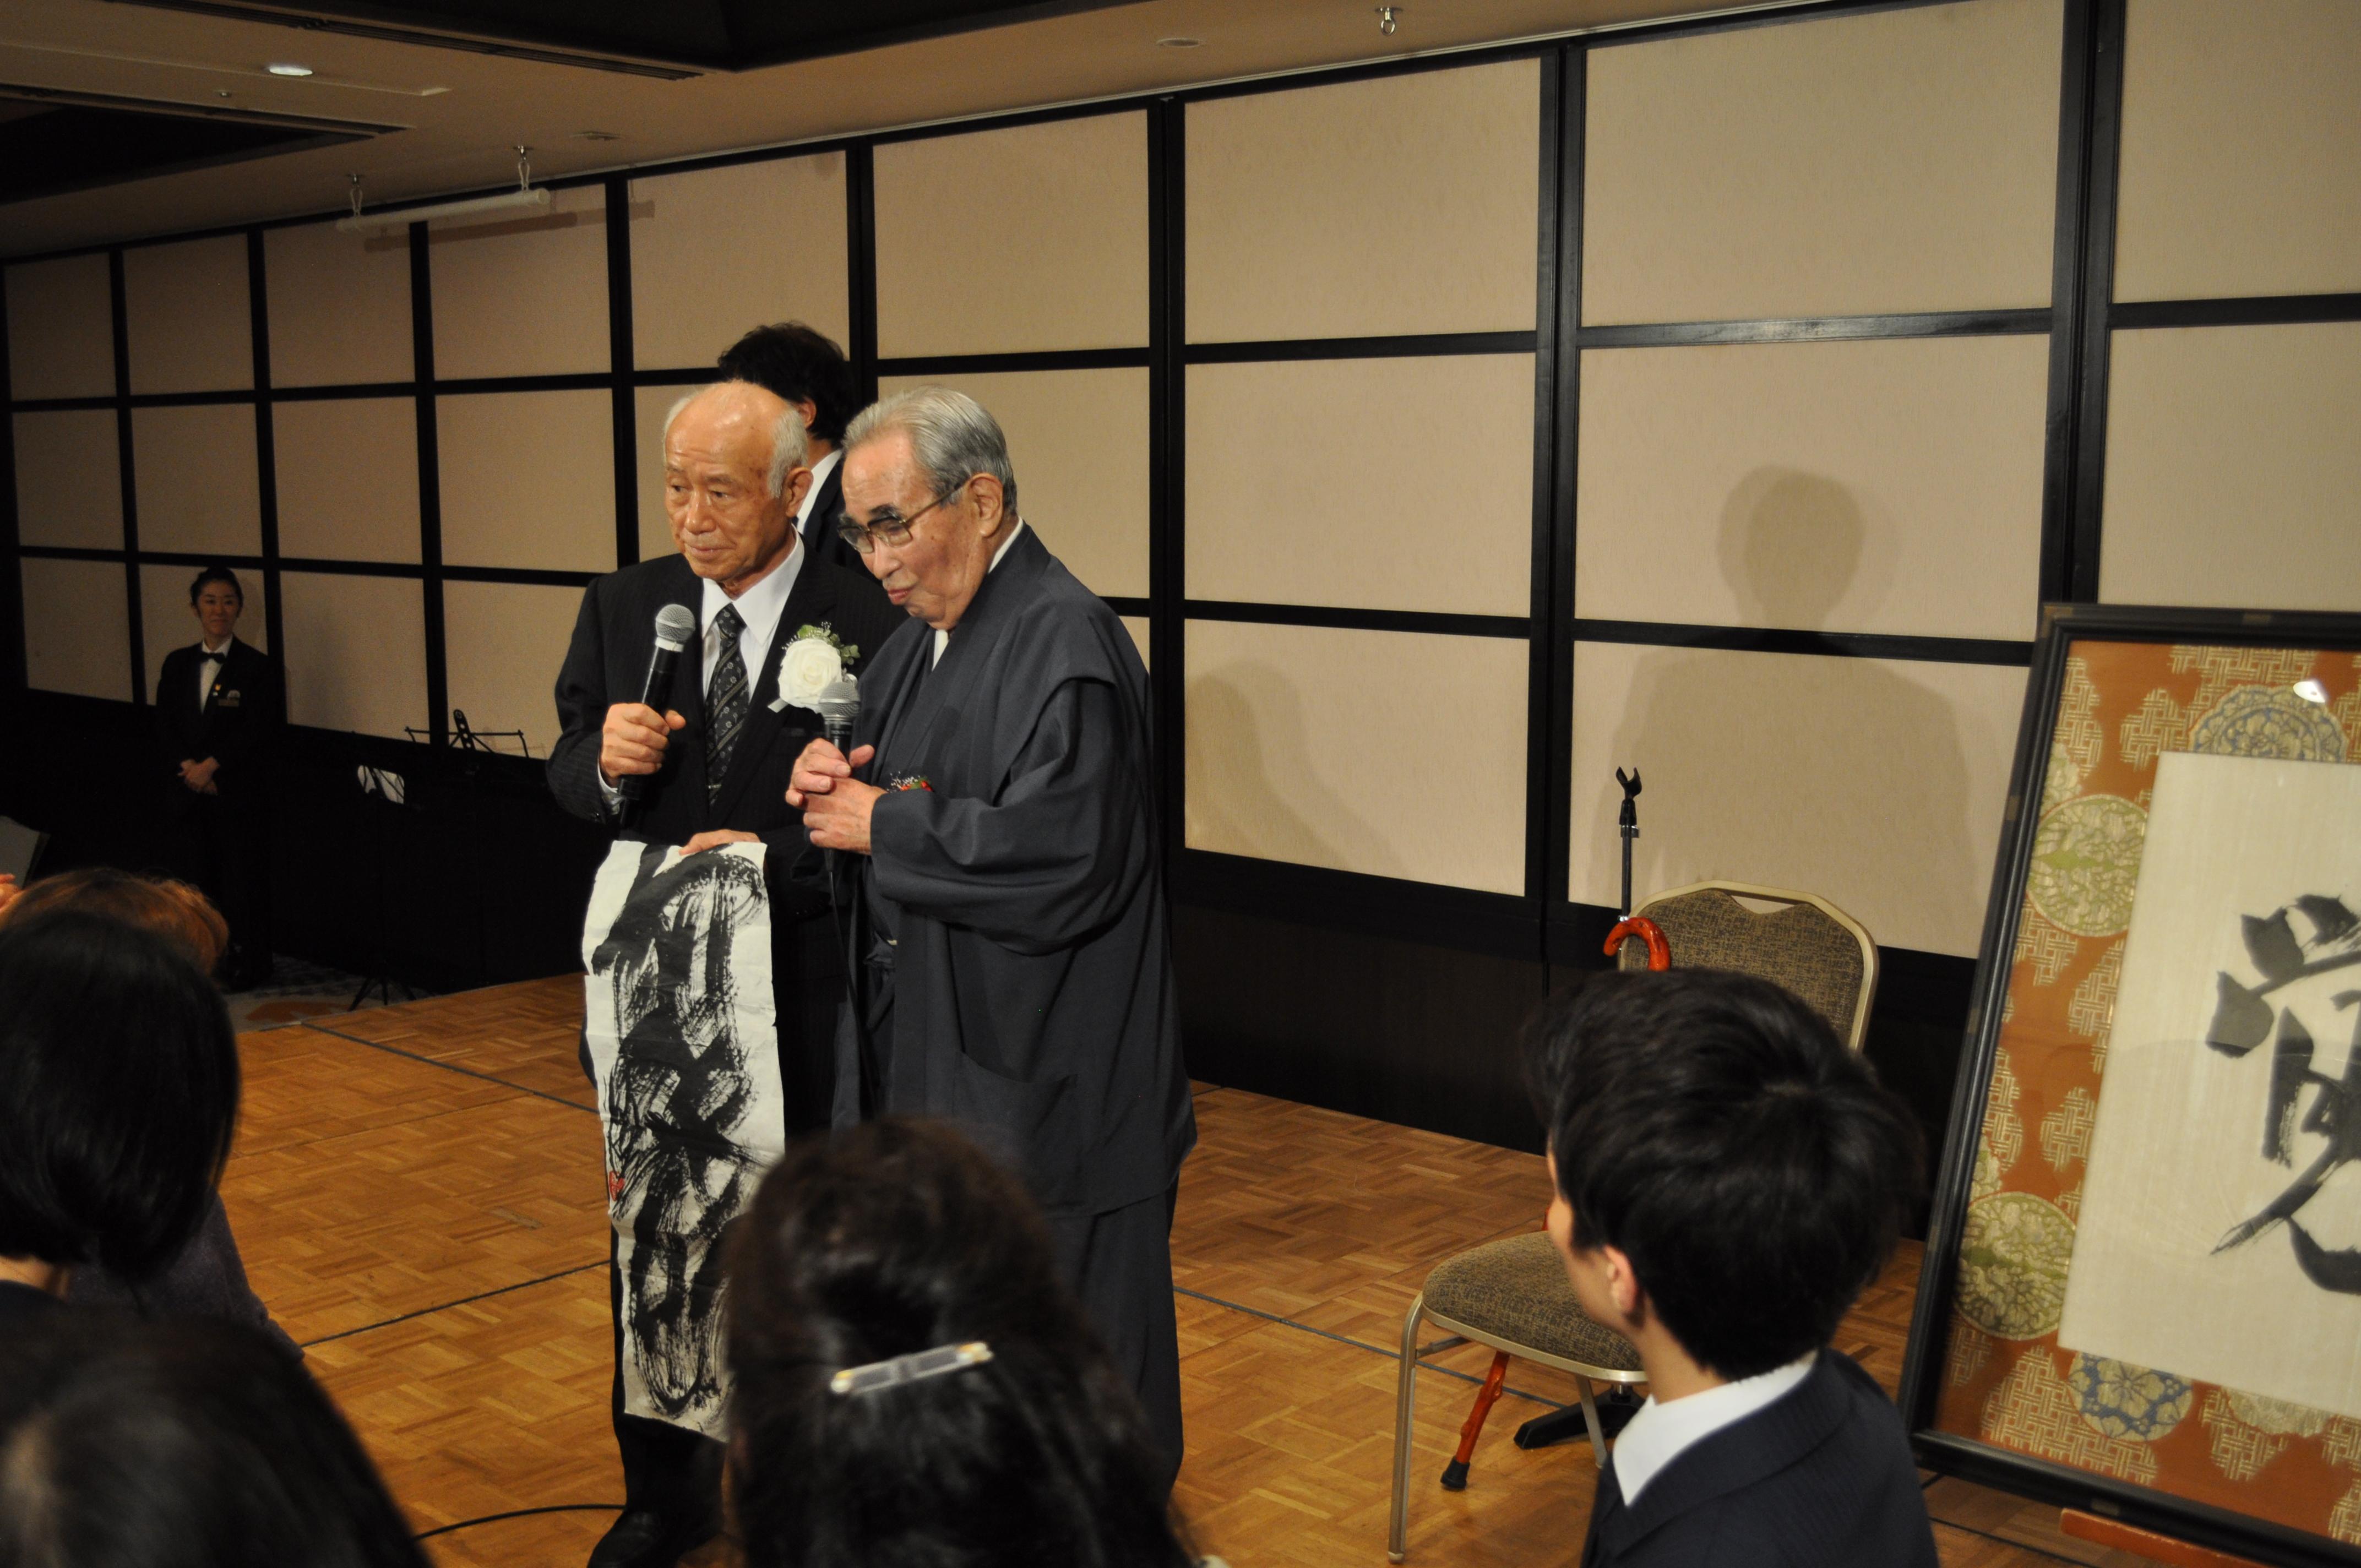 DSC 0597 - 第6回思風会全国大会2018in東京開催